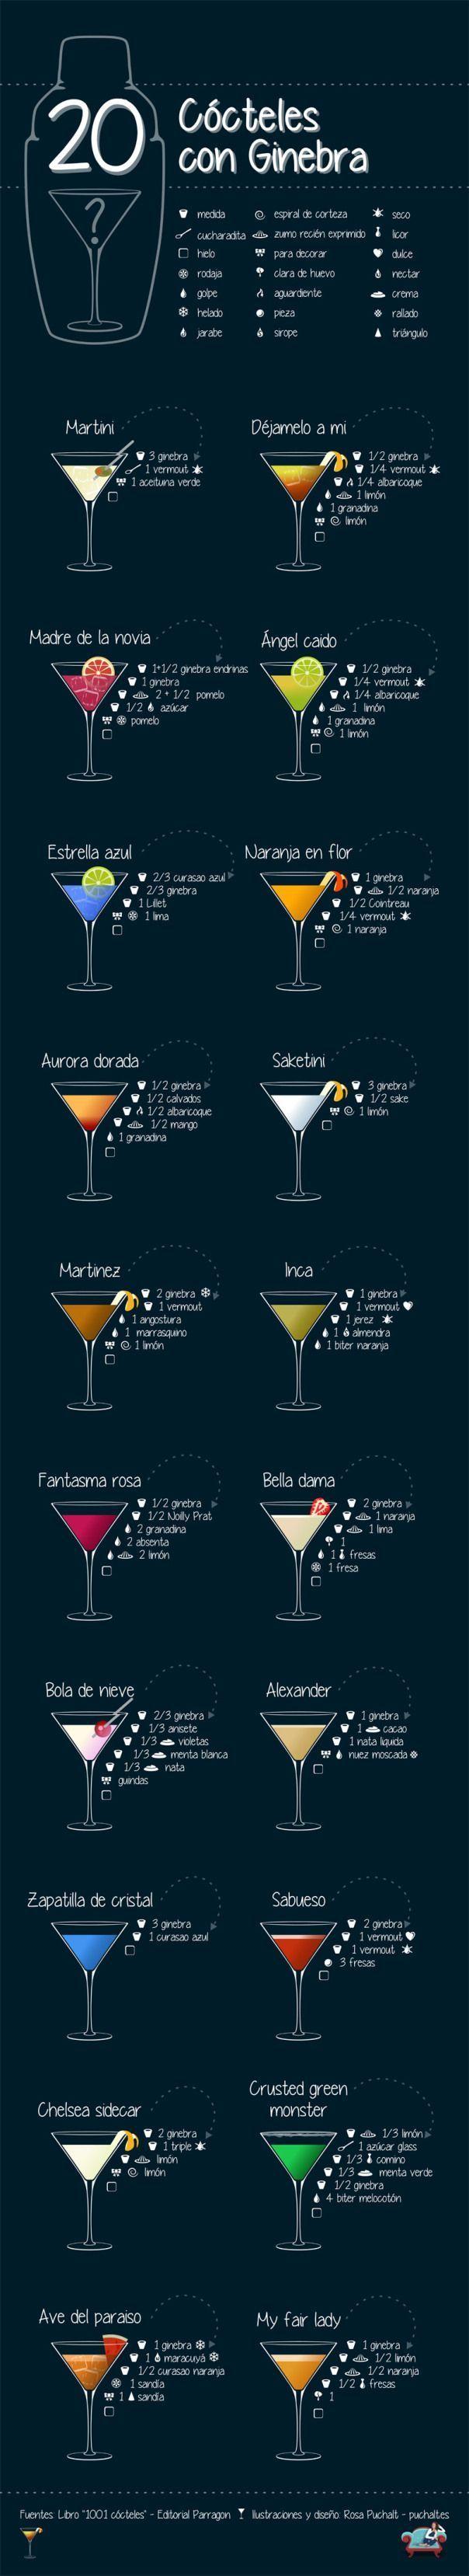 recetas coctelees ginebra gin tonic imprimir